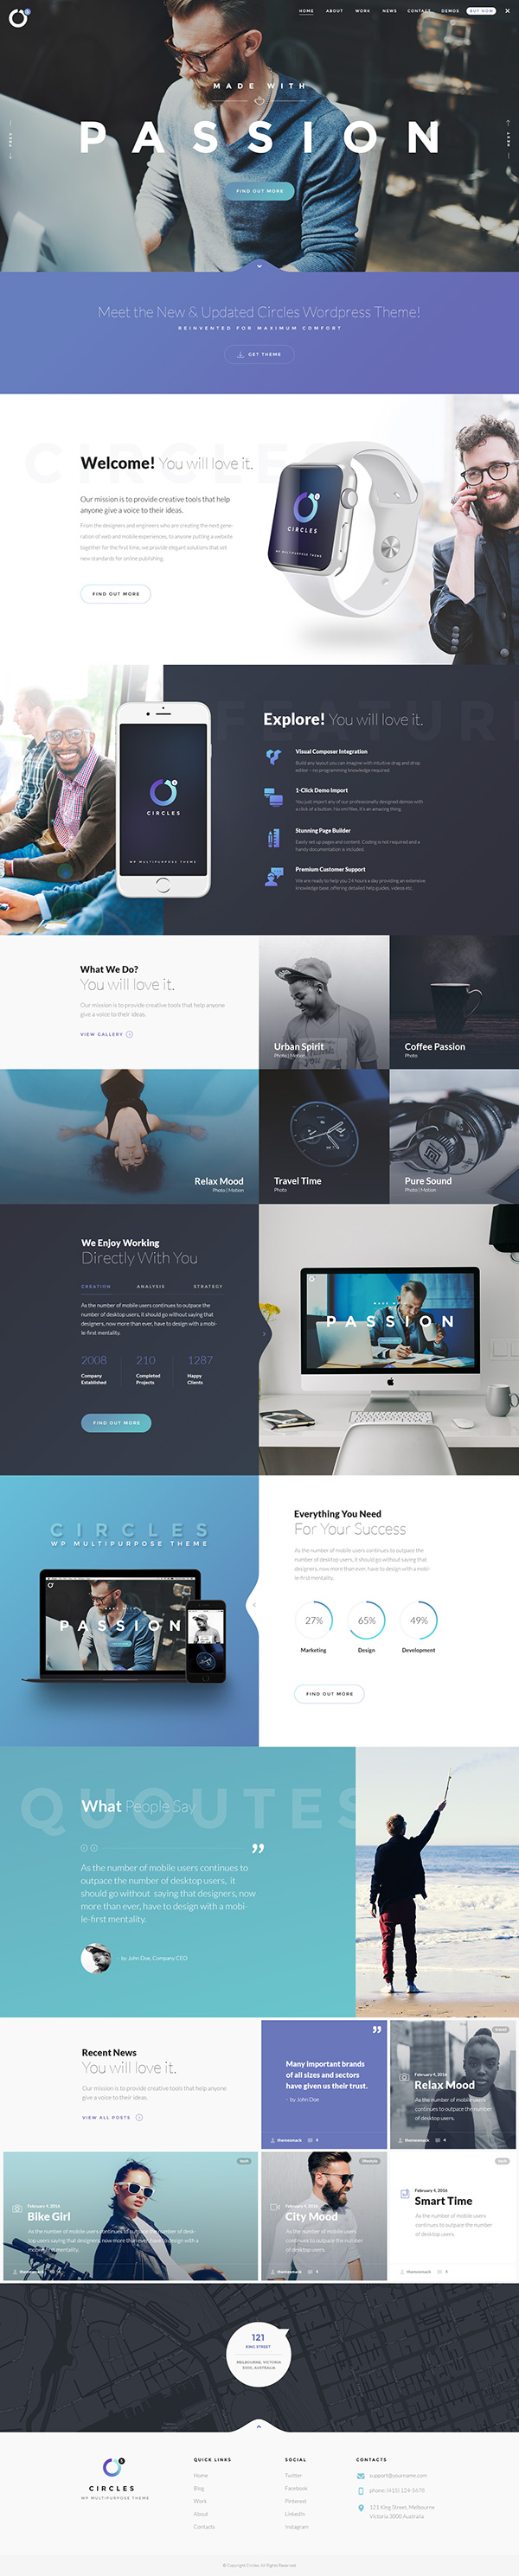 Pin By Guilherme Marchezetti On Web Design Website Design Web Layout Design Web Design